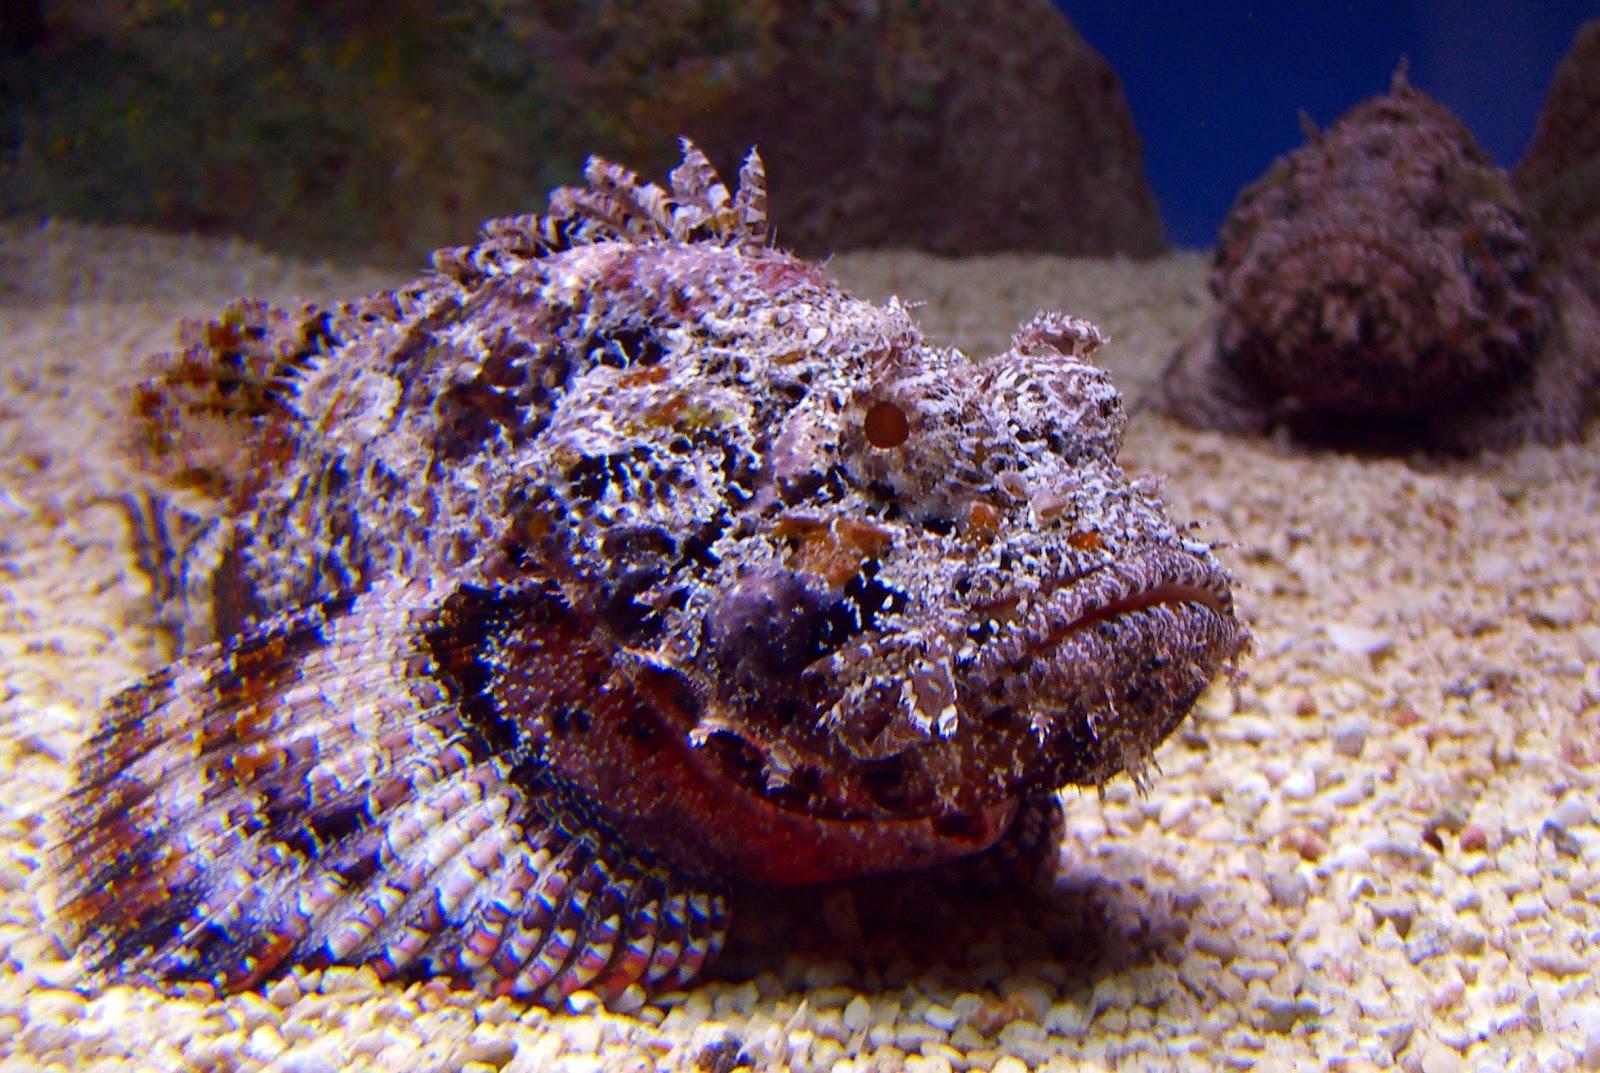 Blok888: Top 10 Most Venomous Animals in the world